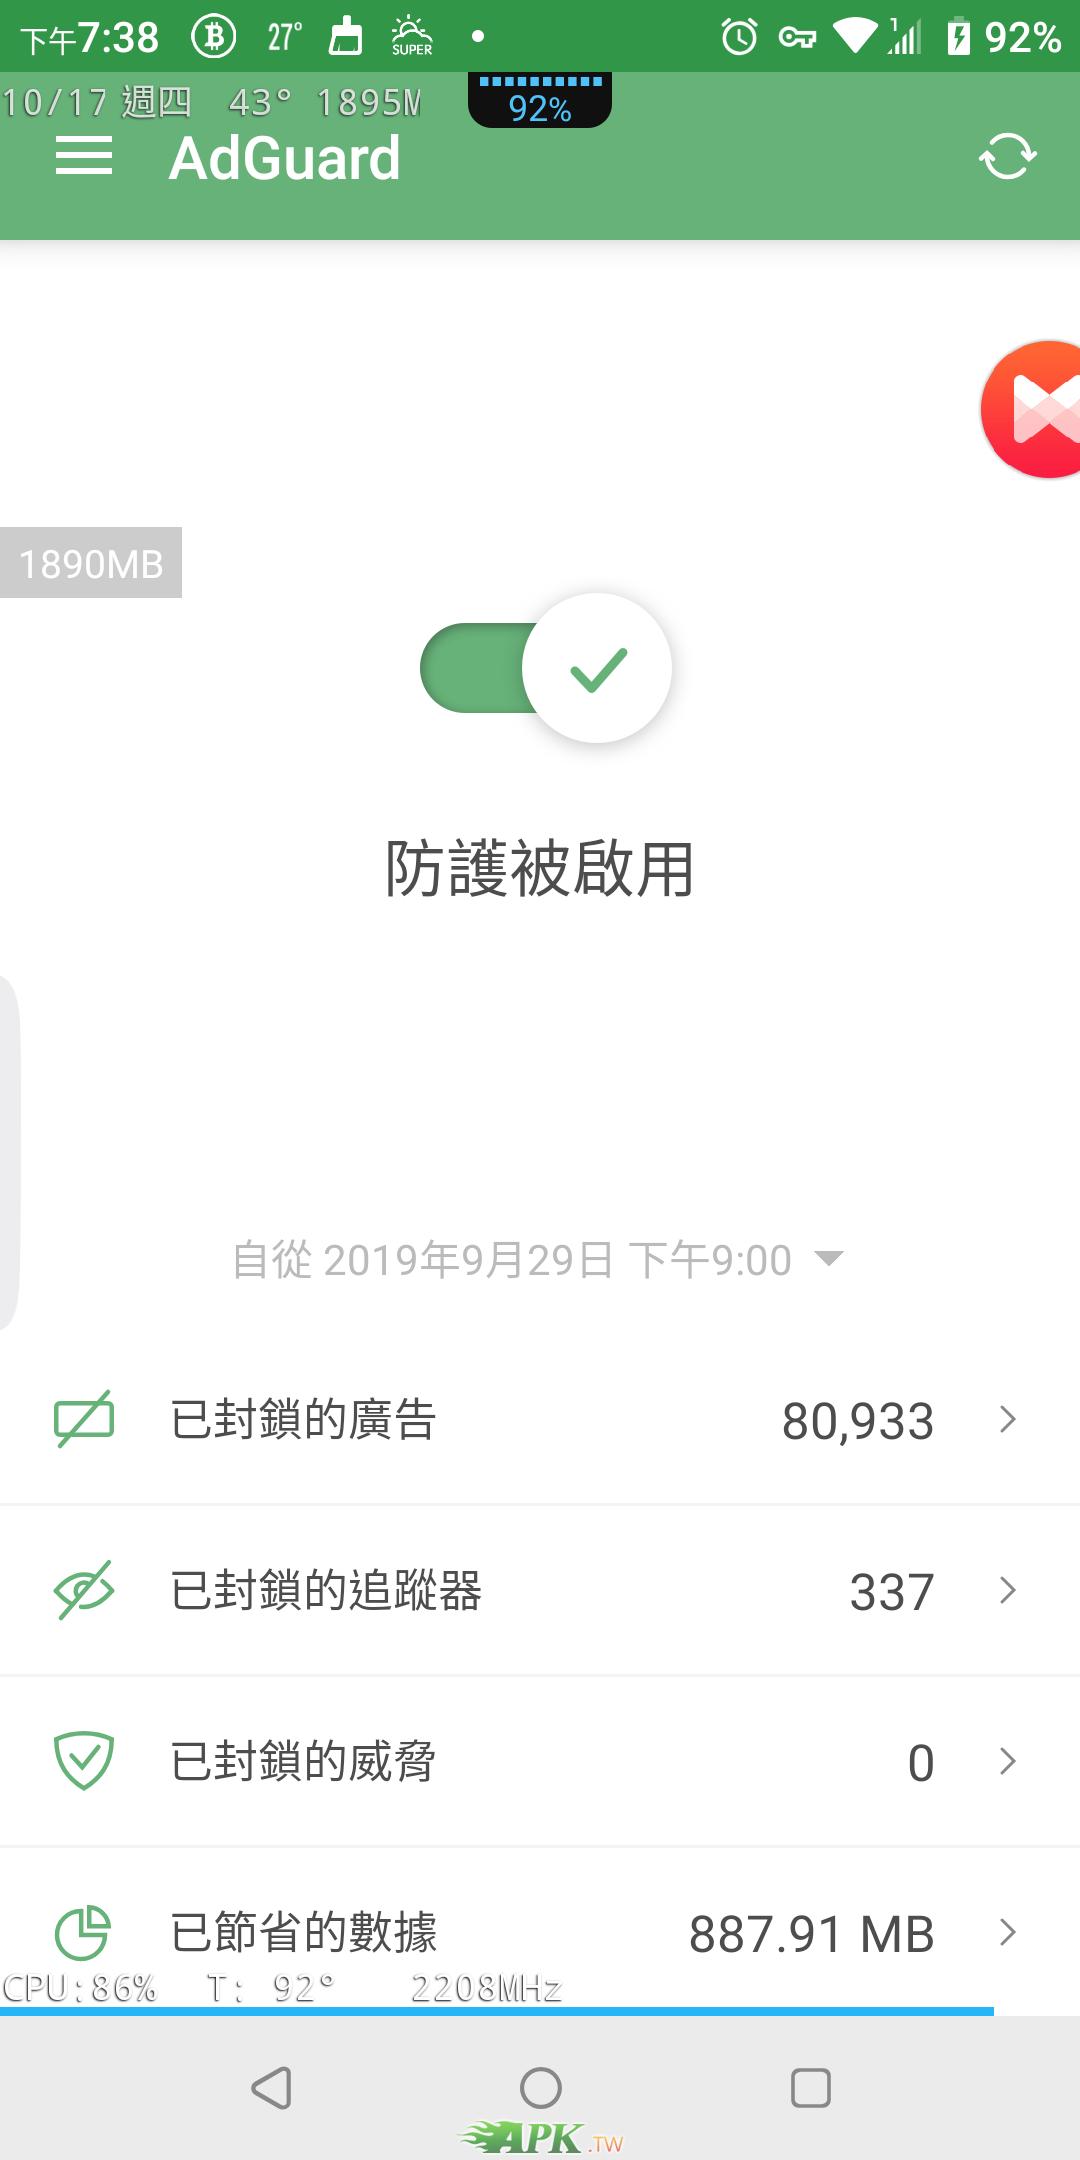 Screenshot_20191017-193835.png